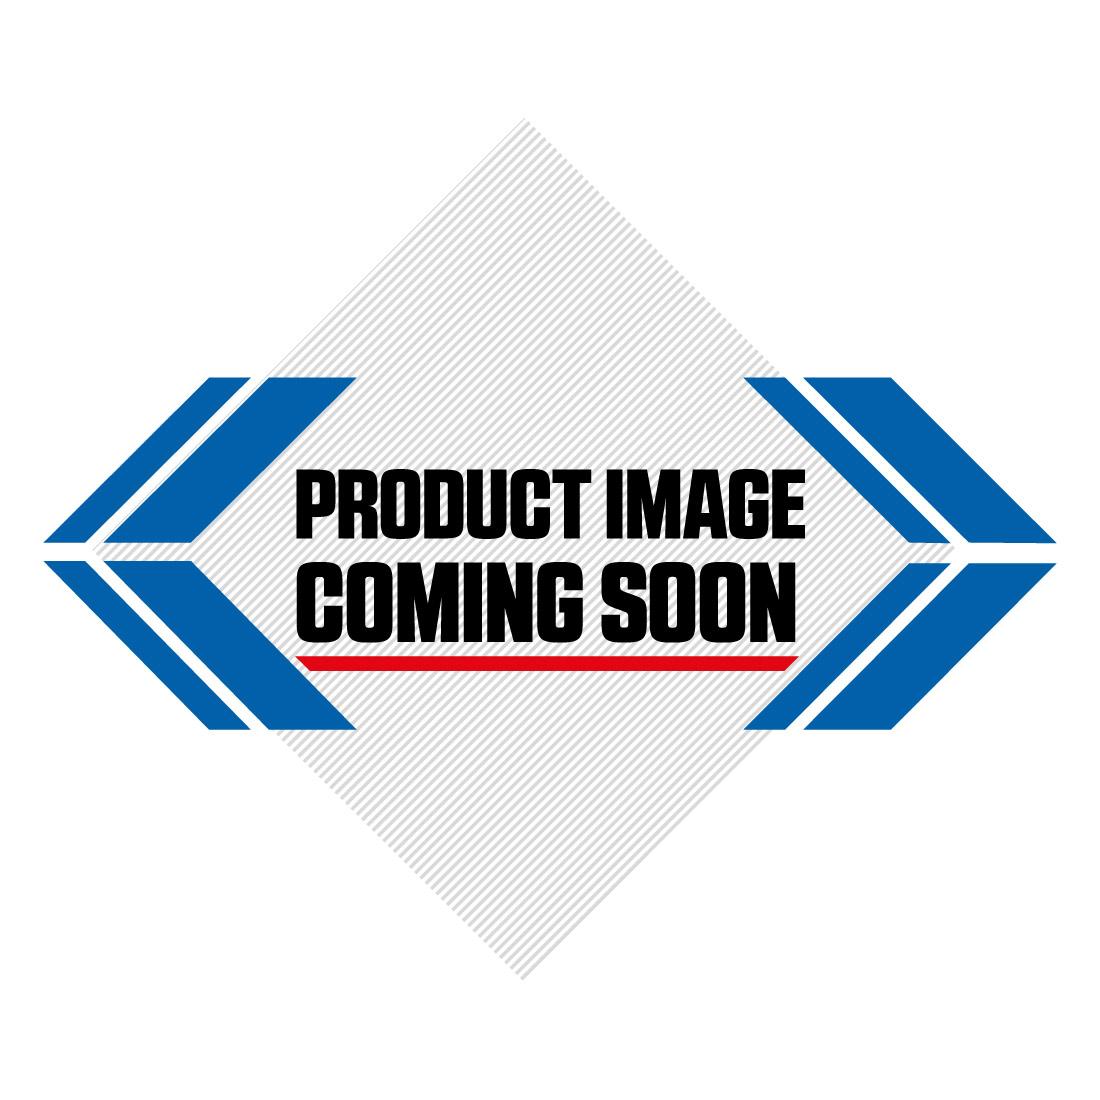 MDR Rip N Roll Hybrid Goggle Tear Offs Packaged